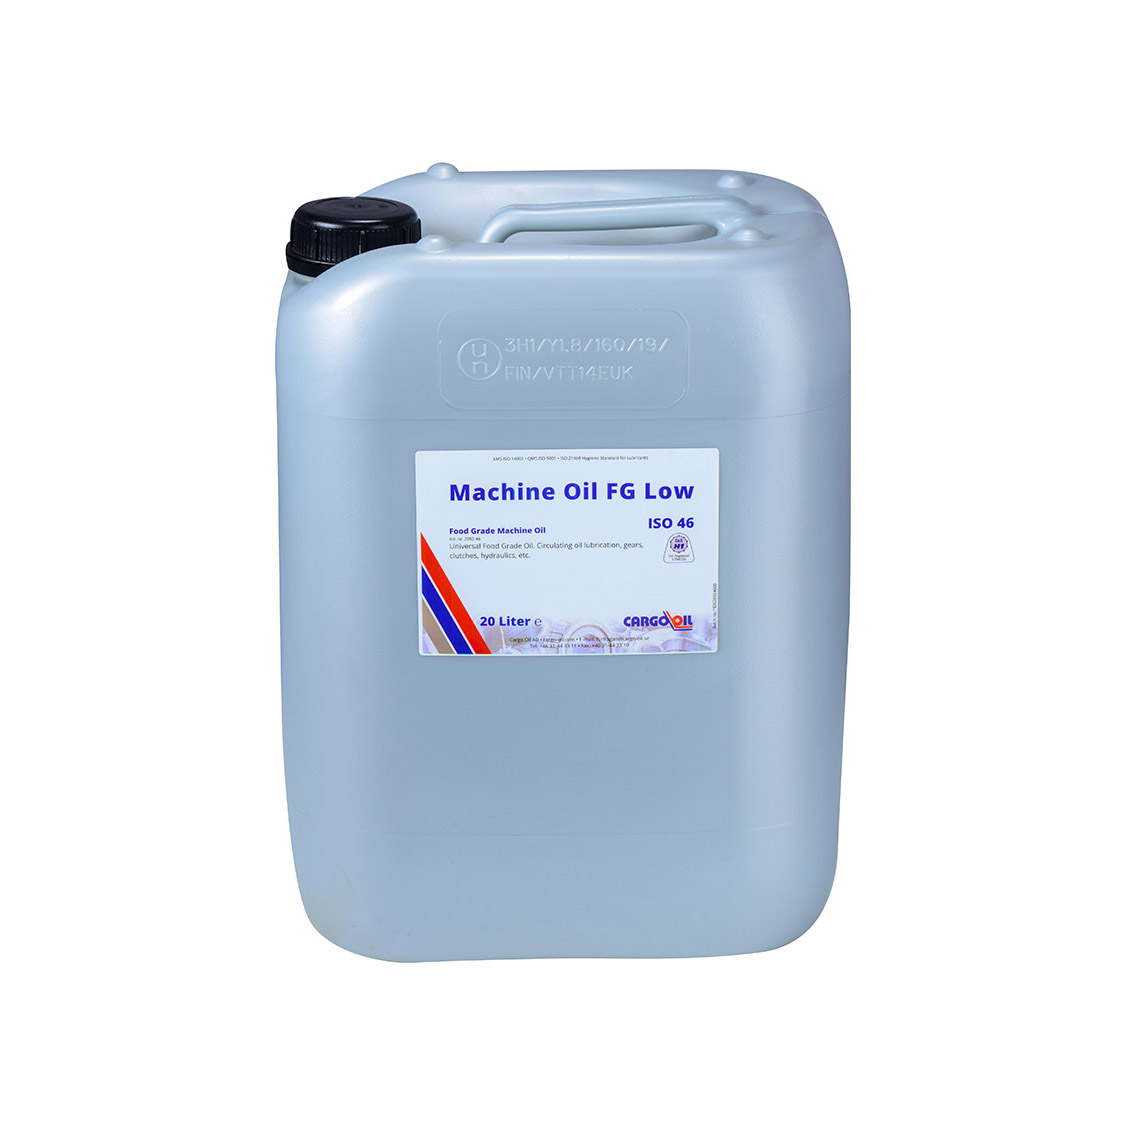 Machine Oil FG Low 食品级合成通用润滑油